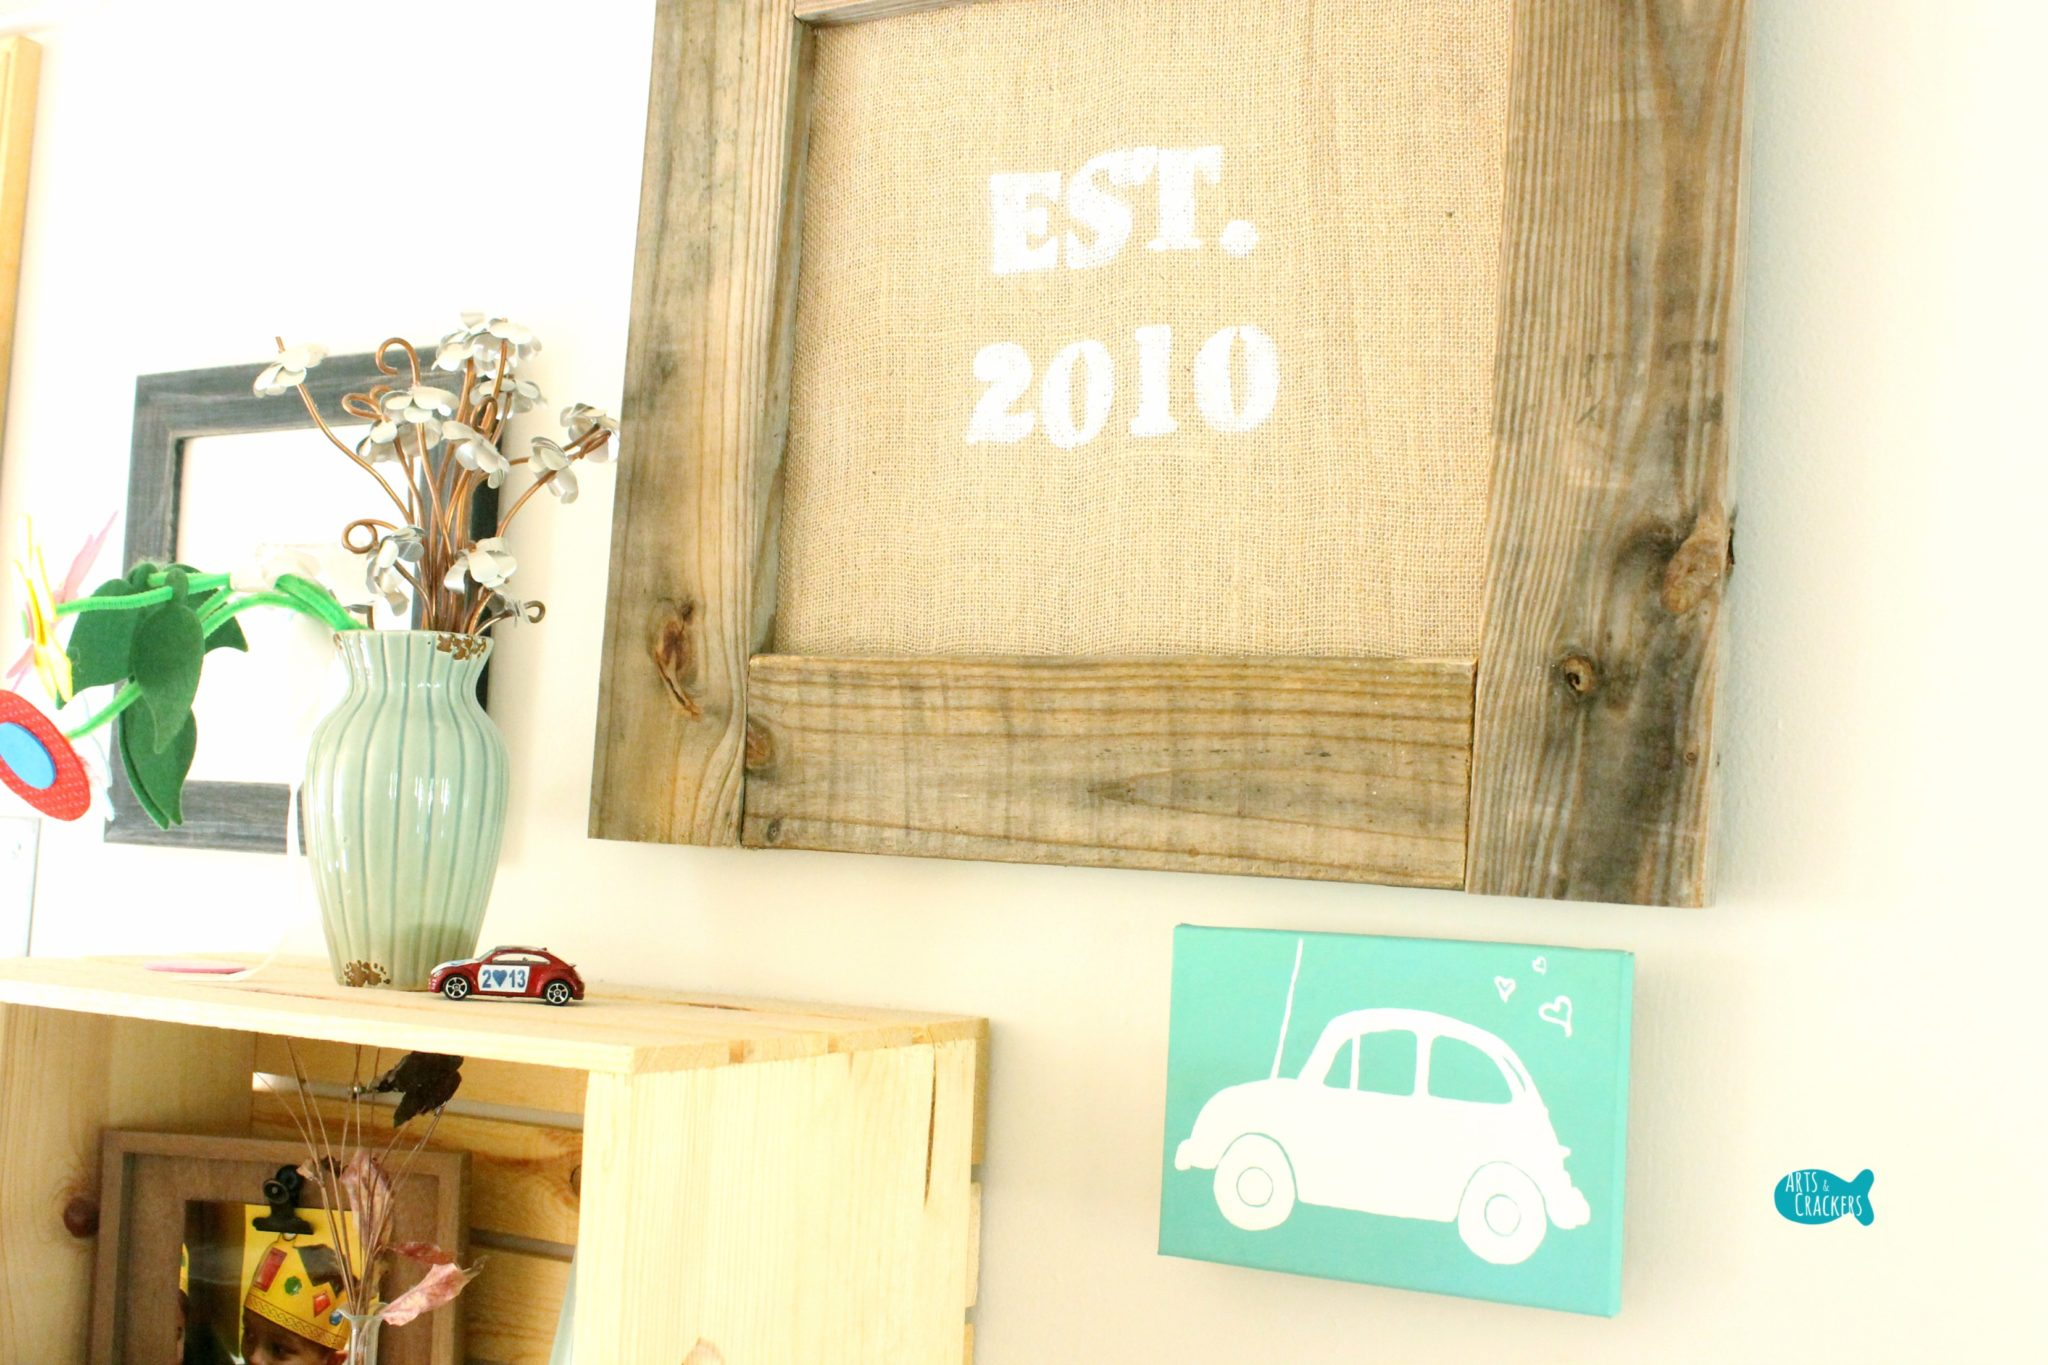 10 Ways to Make Your Rental House Feel Like Home